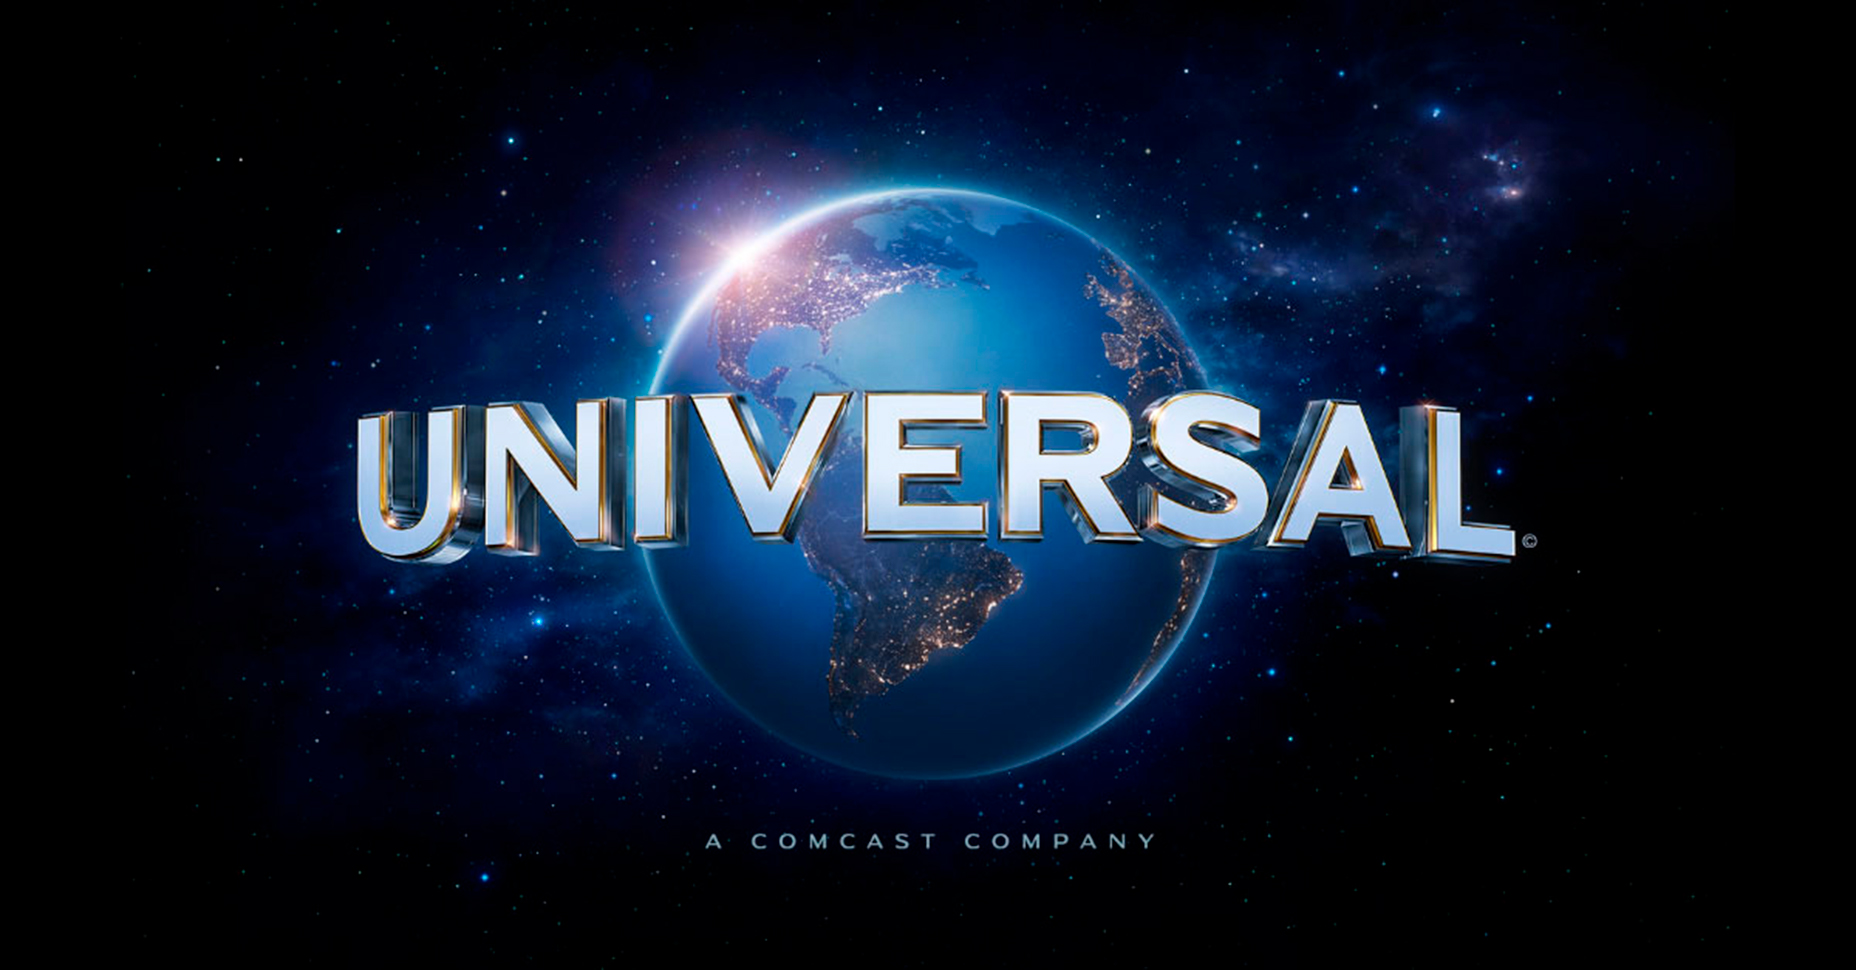 Universal Pictures abre convocatoria para compositores